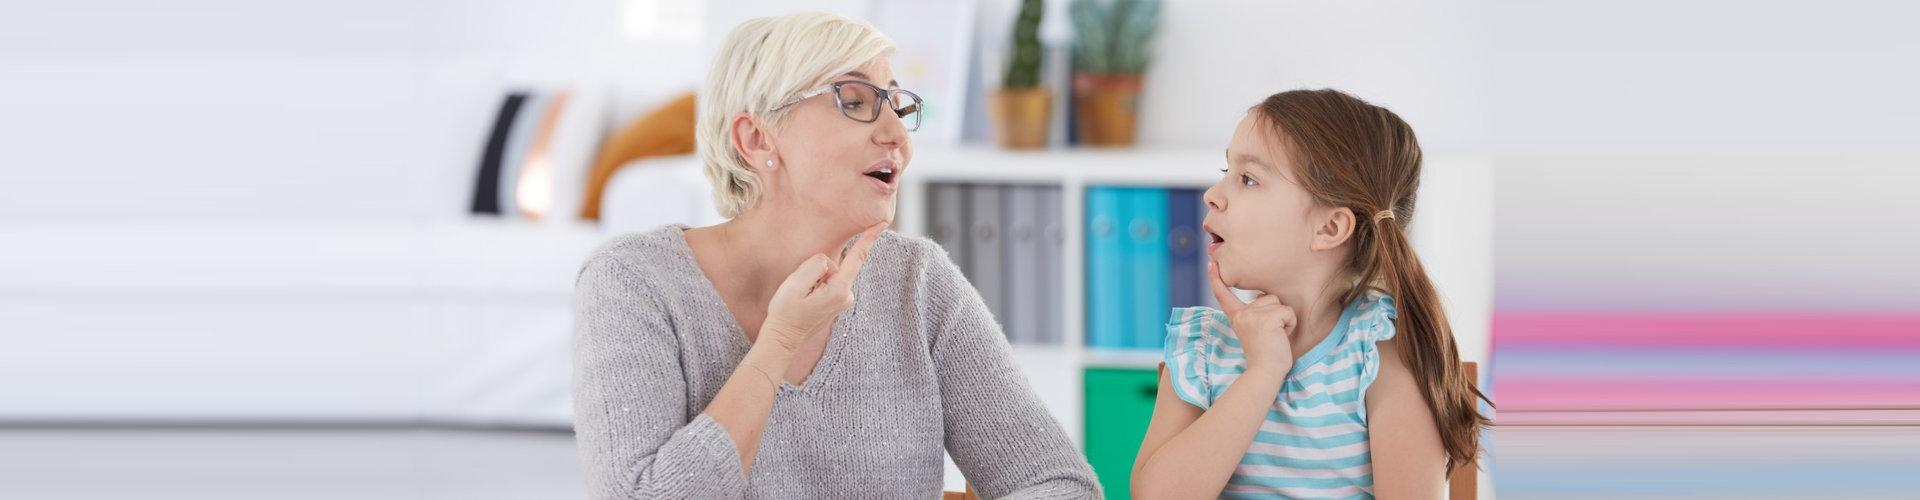 woman teaching a girl sign language